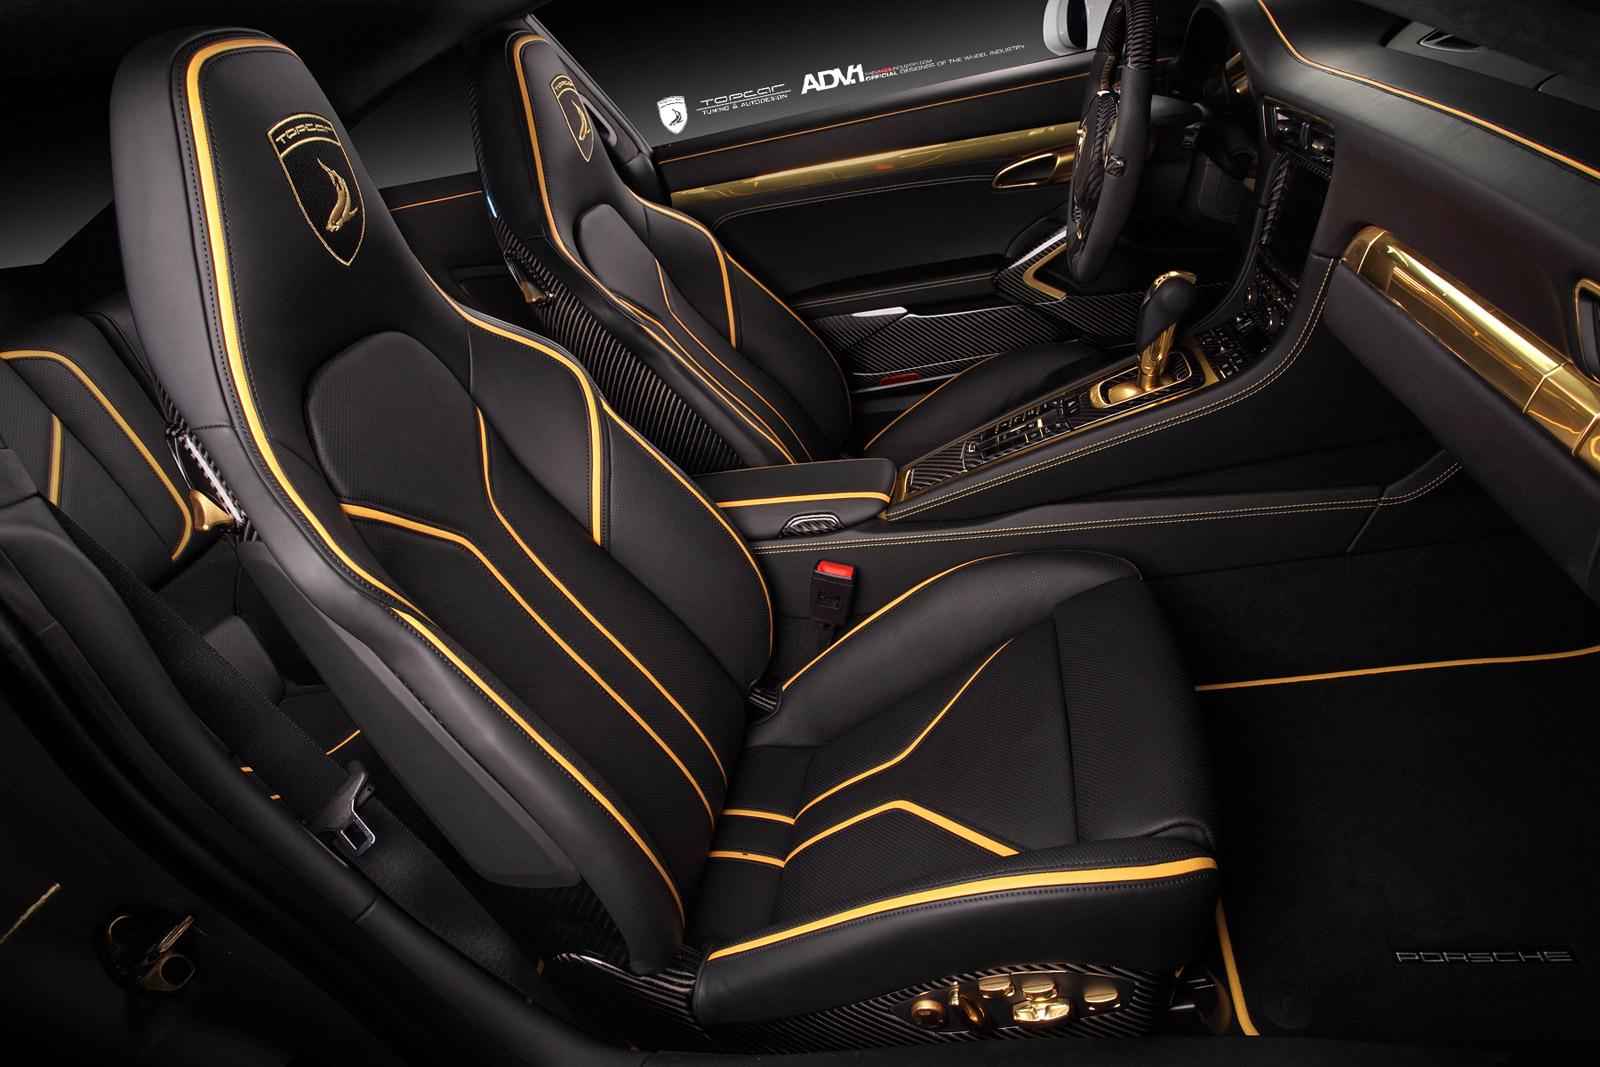 porsche-911-turbo-typ-991-topcar-stinger-gtr-025